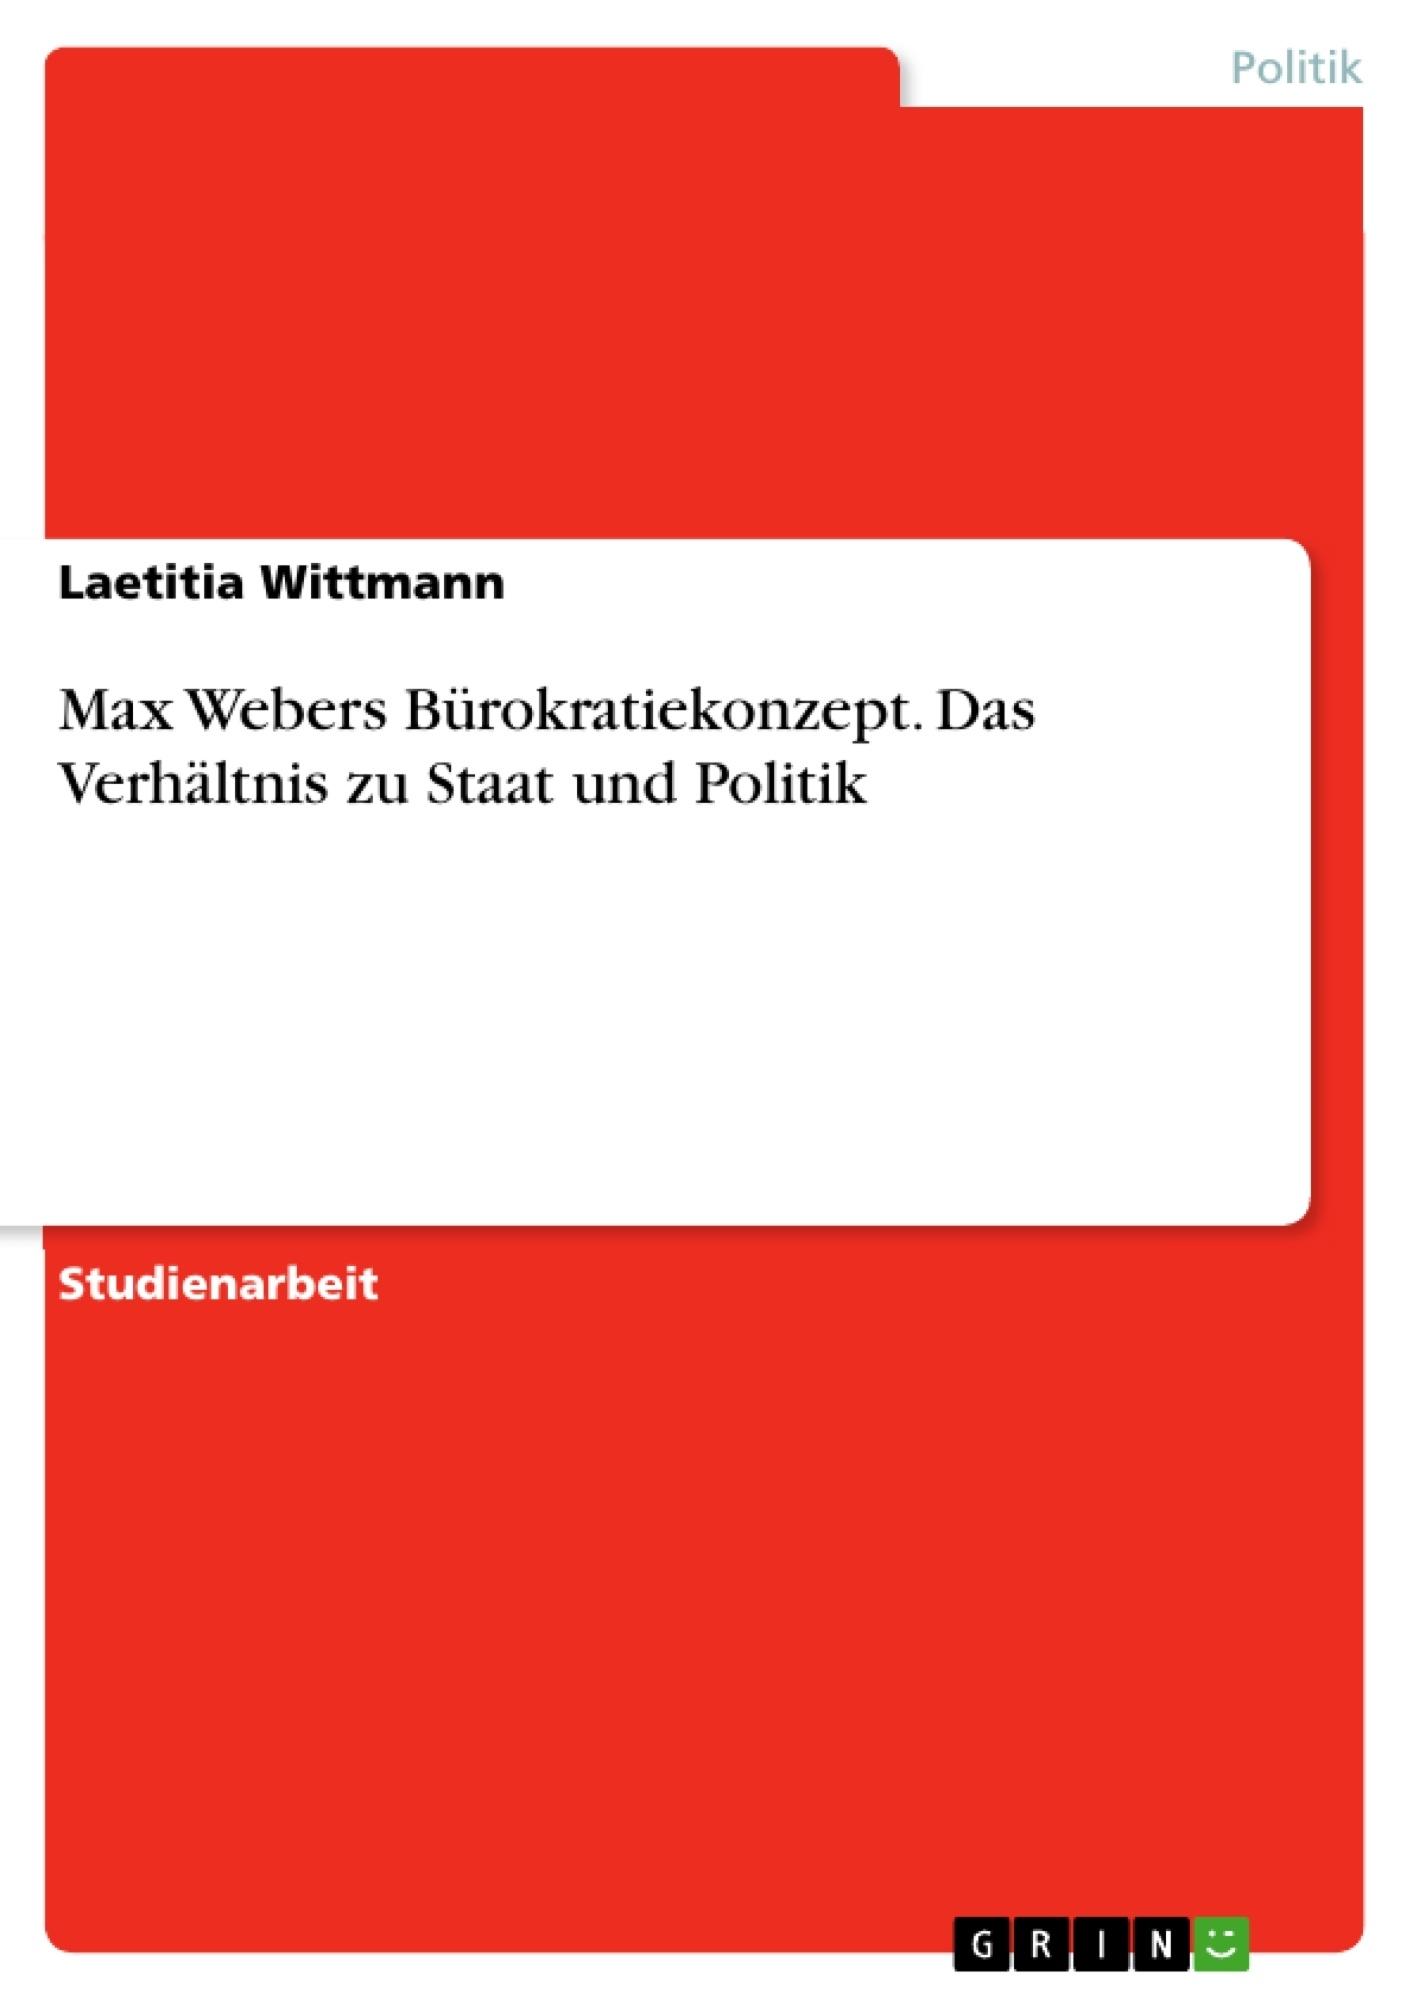 Titel: Max Webers Bürokratiekonzept. Das Verhältnis zu Staat und Politik